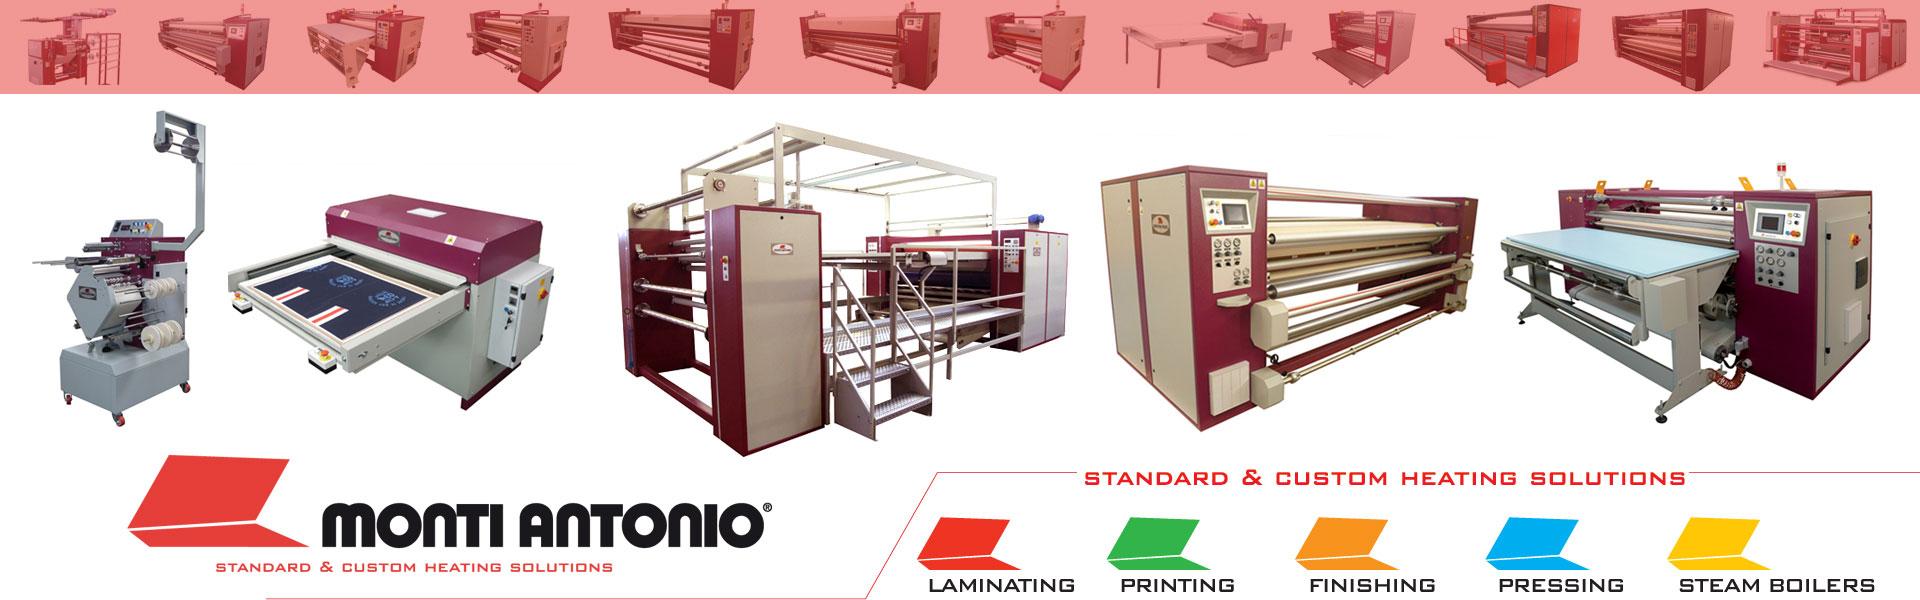 Monti-Antonio-digital-textile-printers